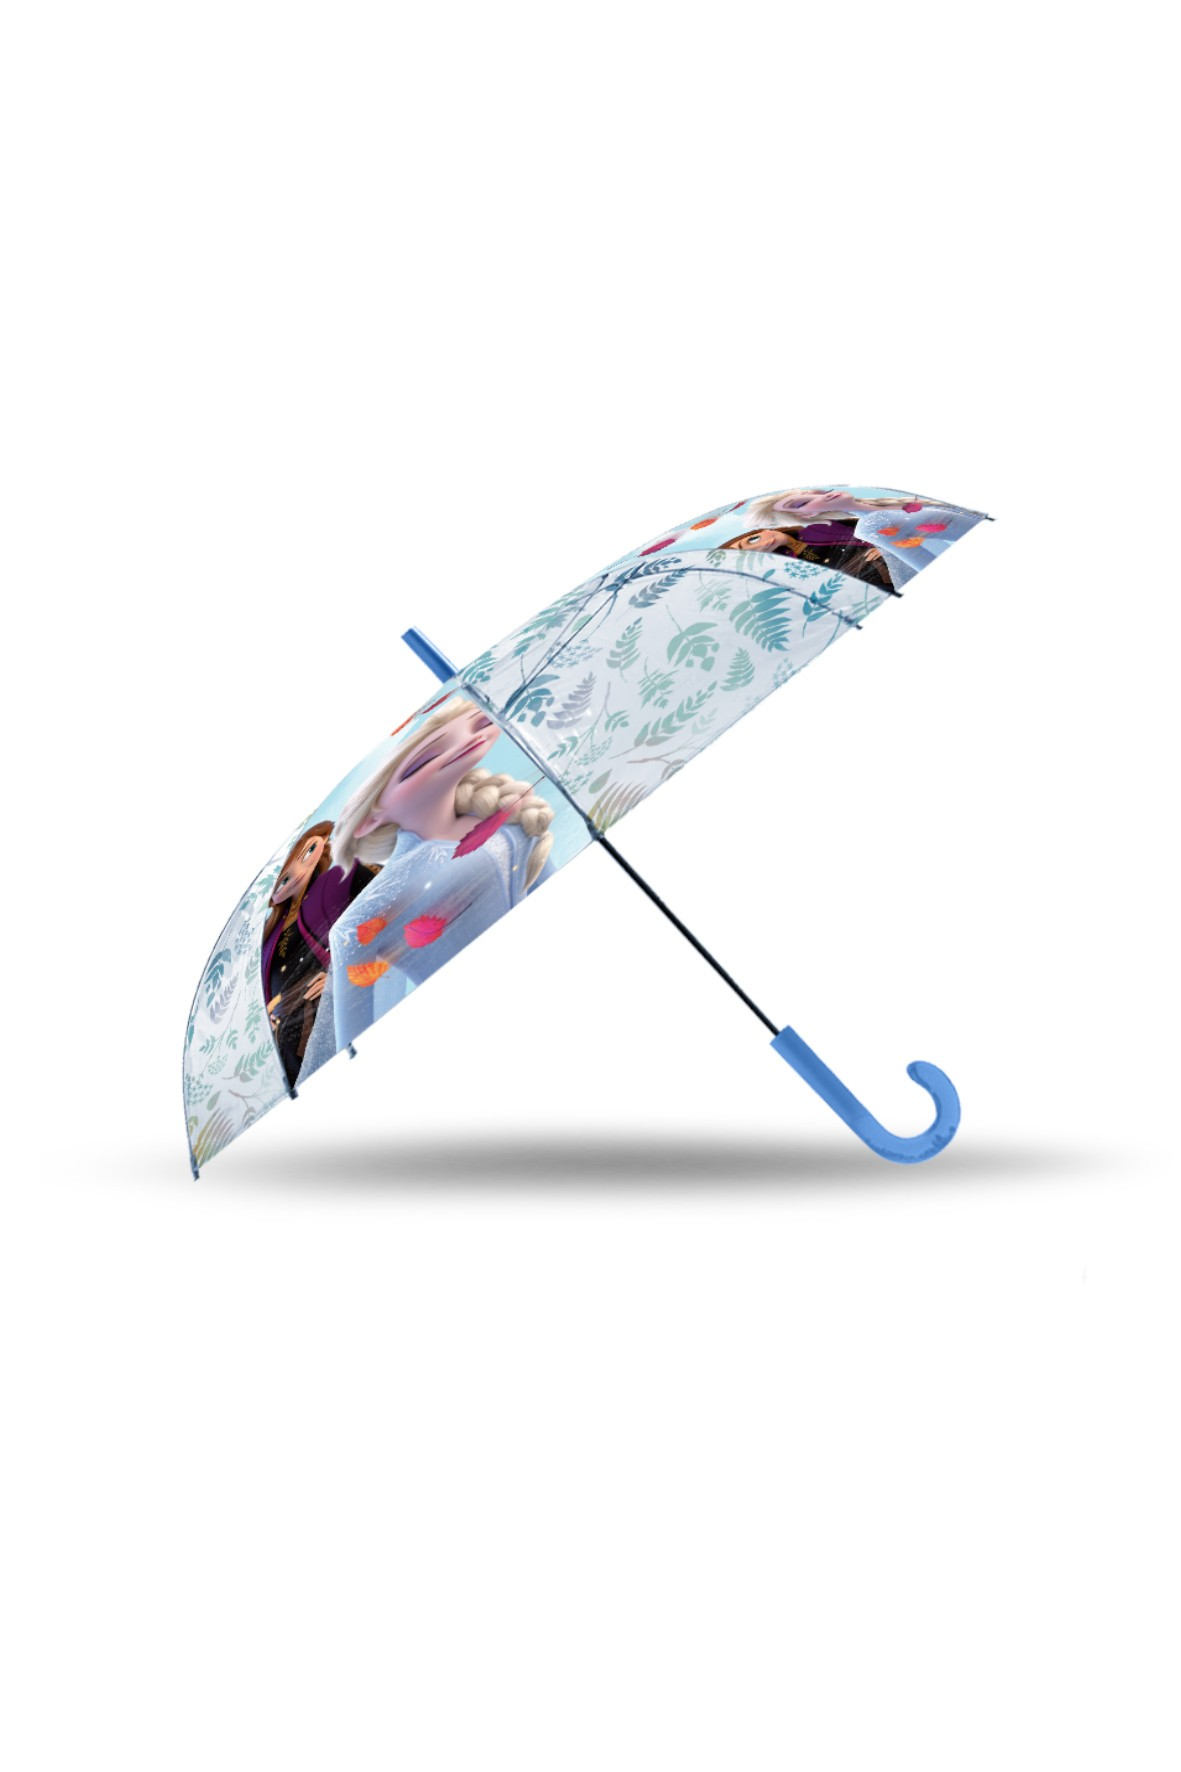 Parasolka dla dziecka Frozen